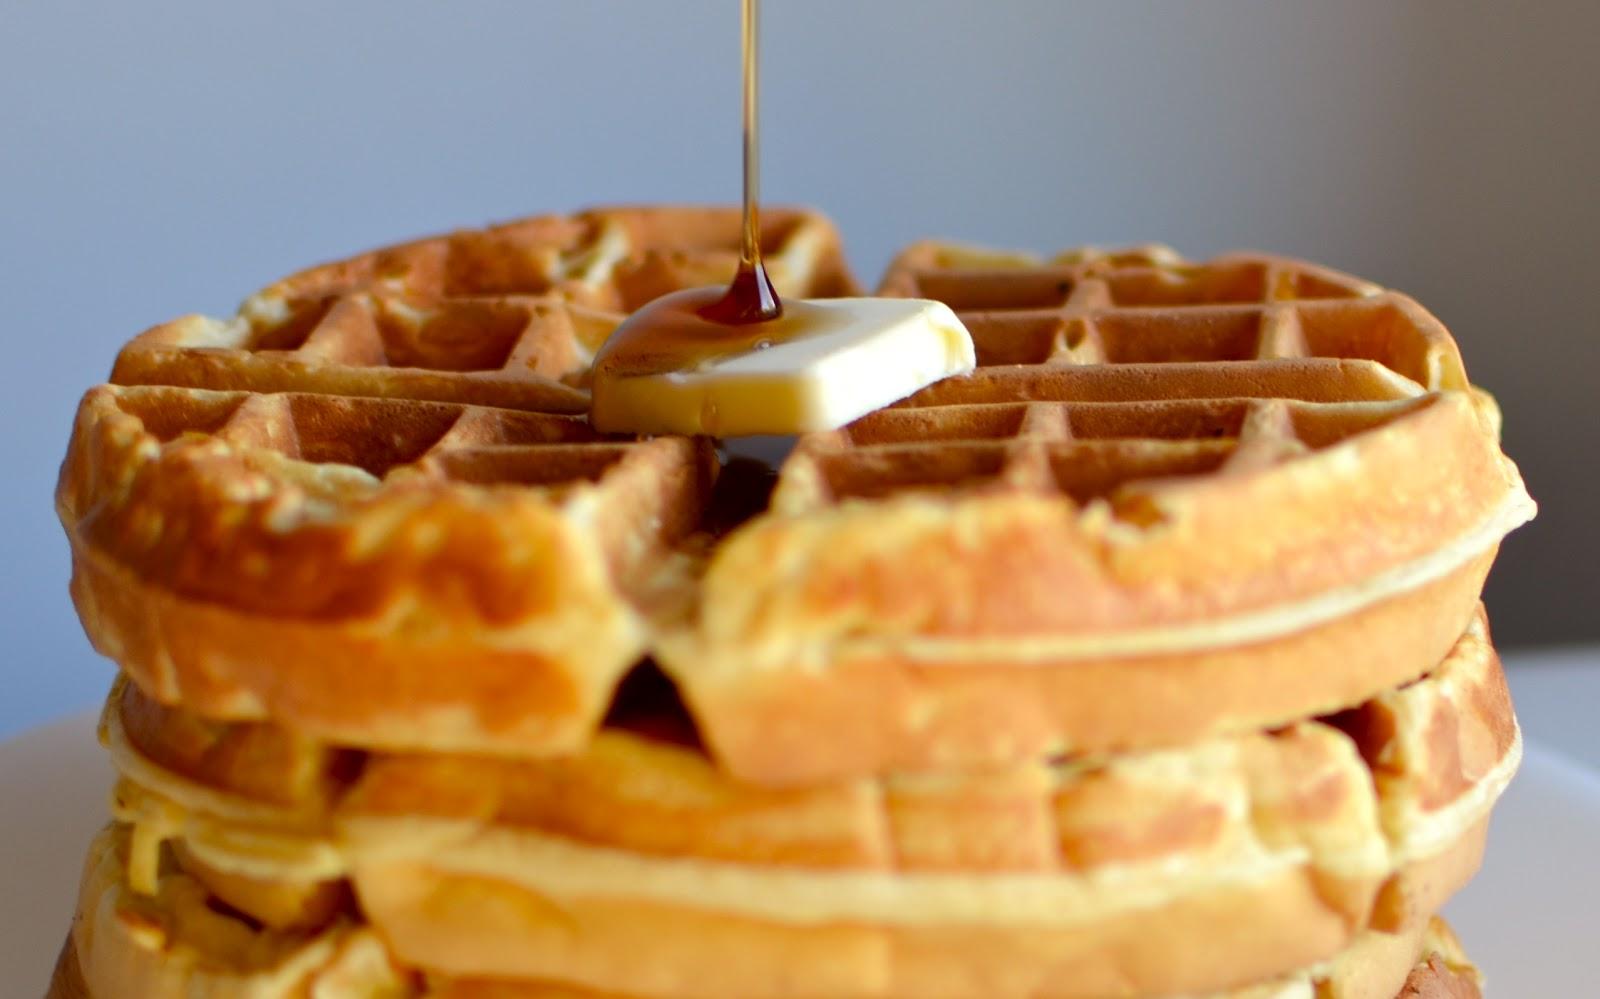 Yammie's Noshery: Copycat Hotel Waffles